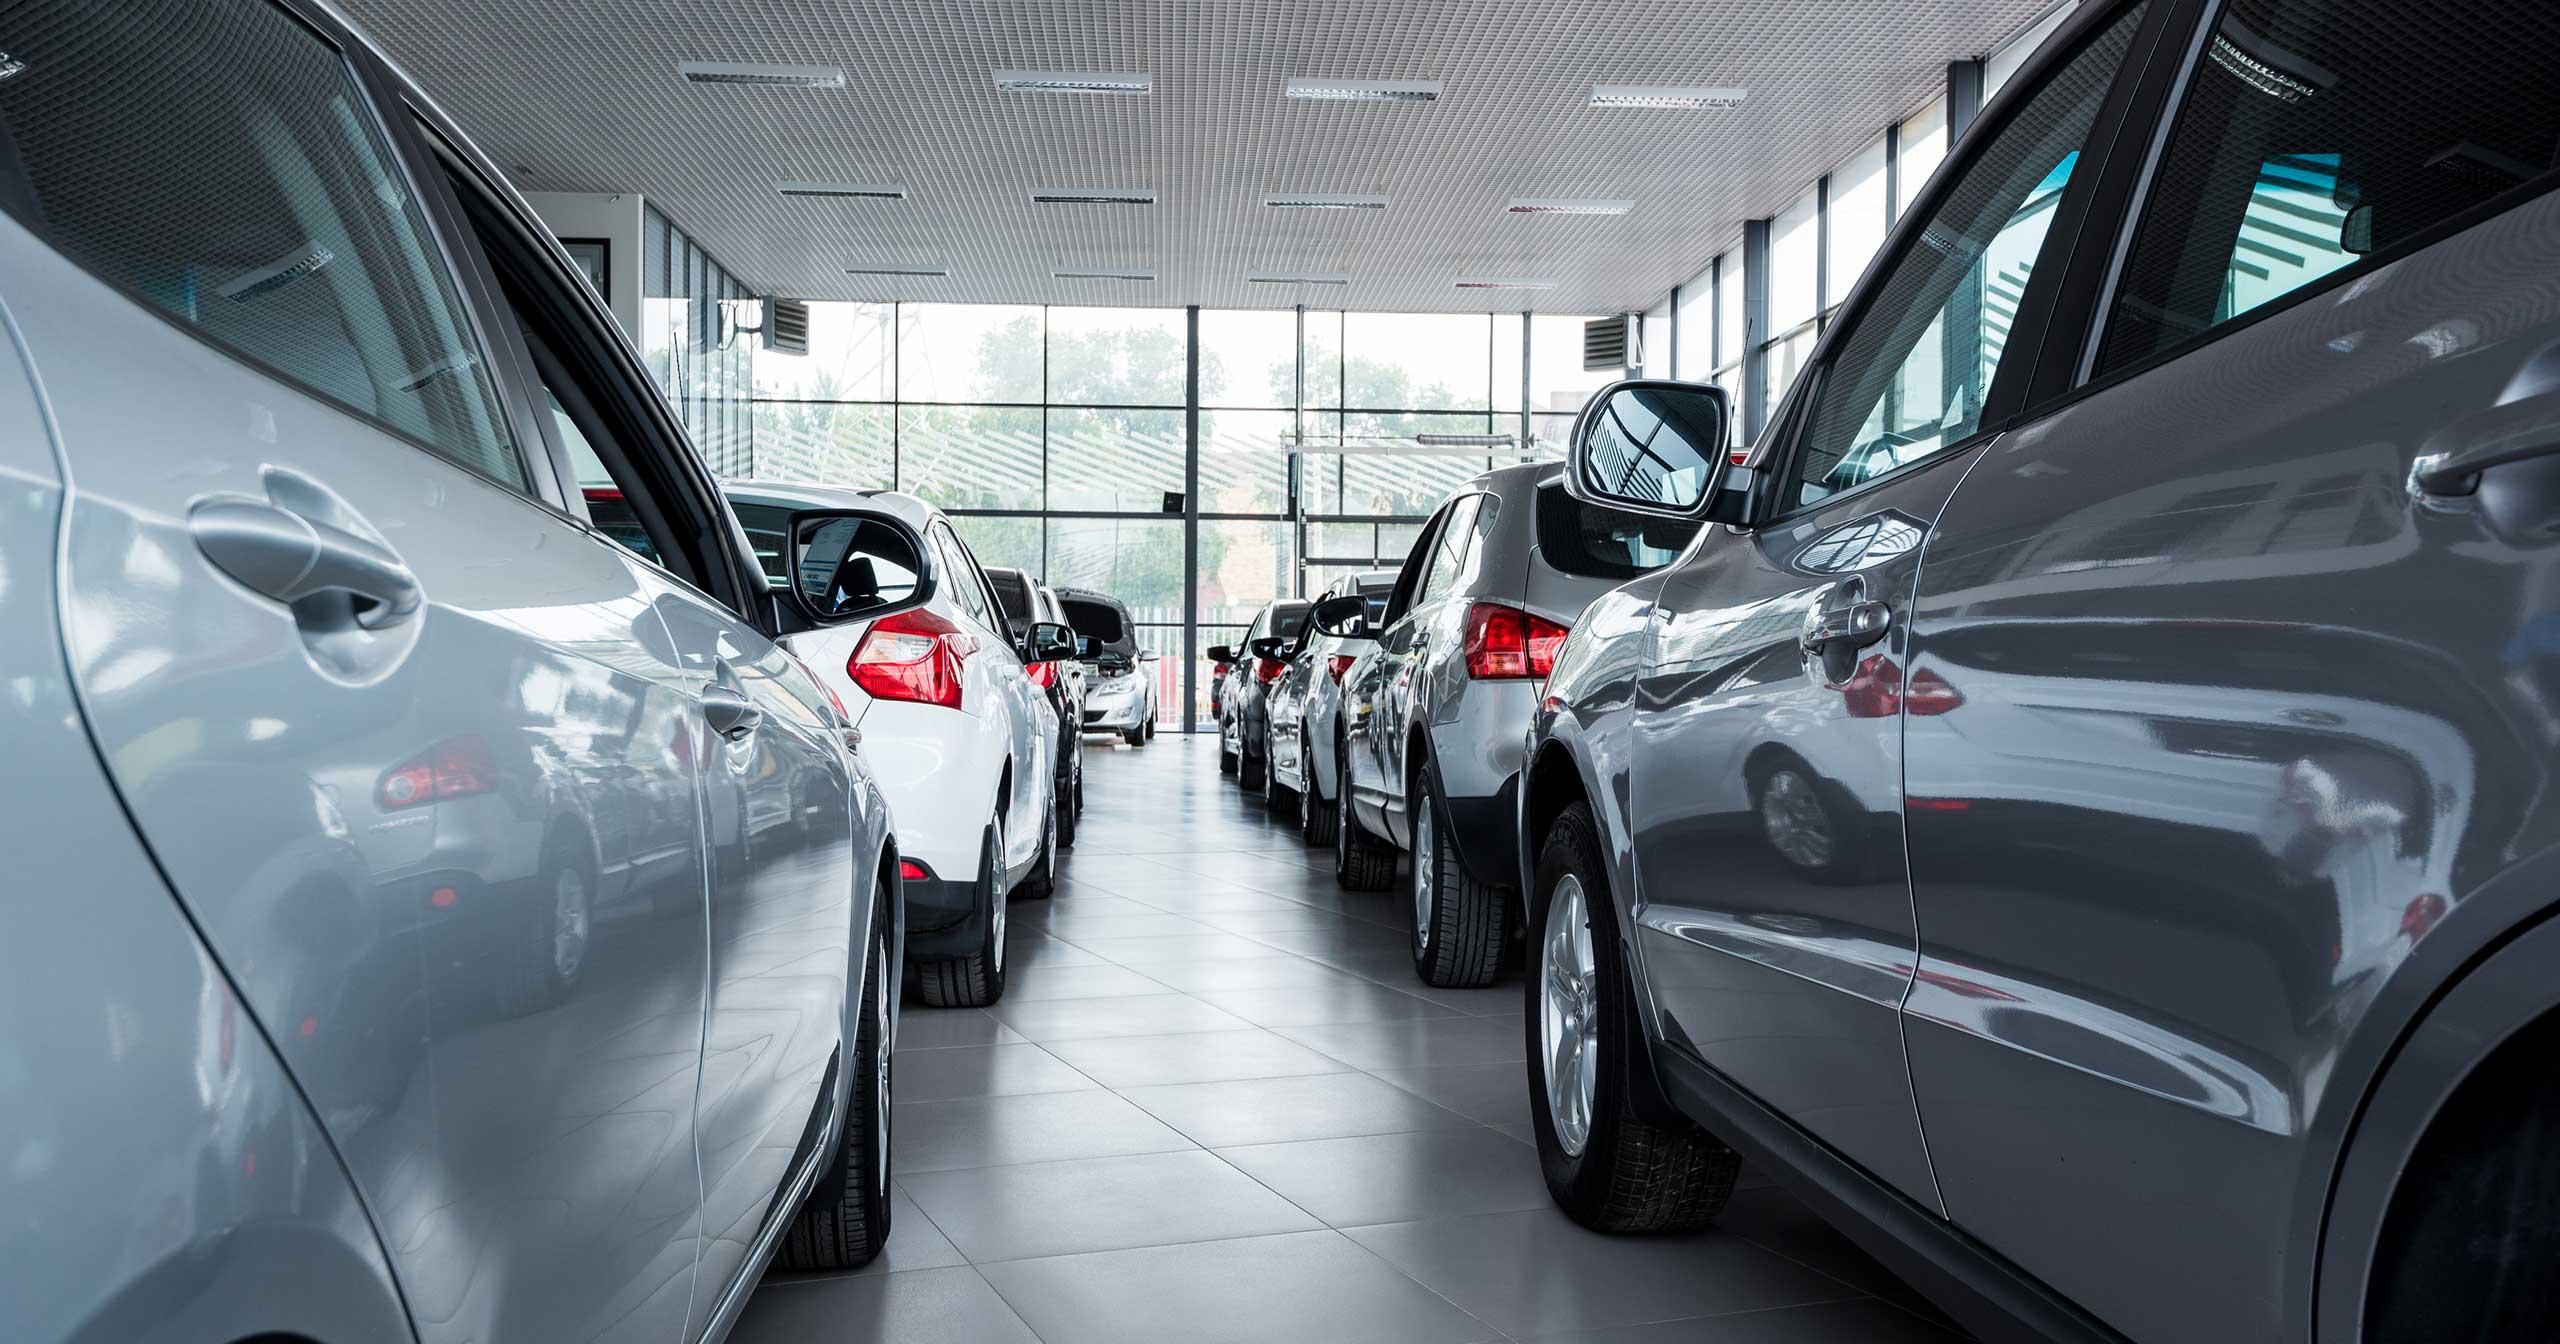 2018 Consumer Survey of Automotive Finance Perceptions Chile